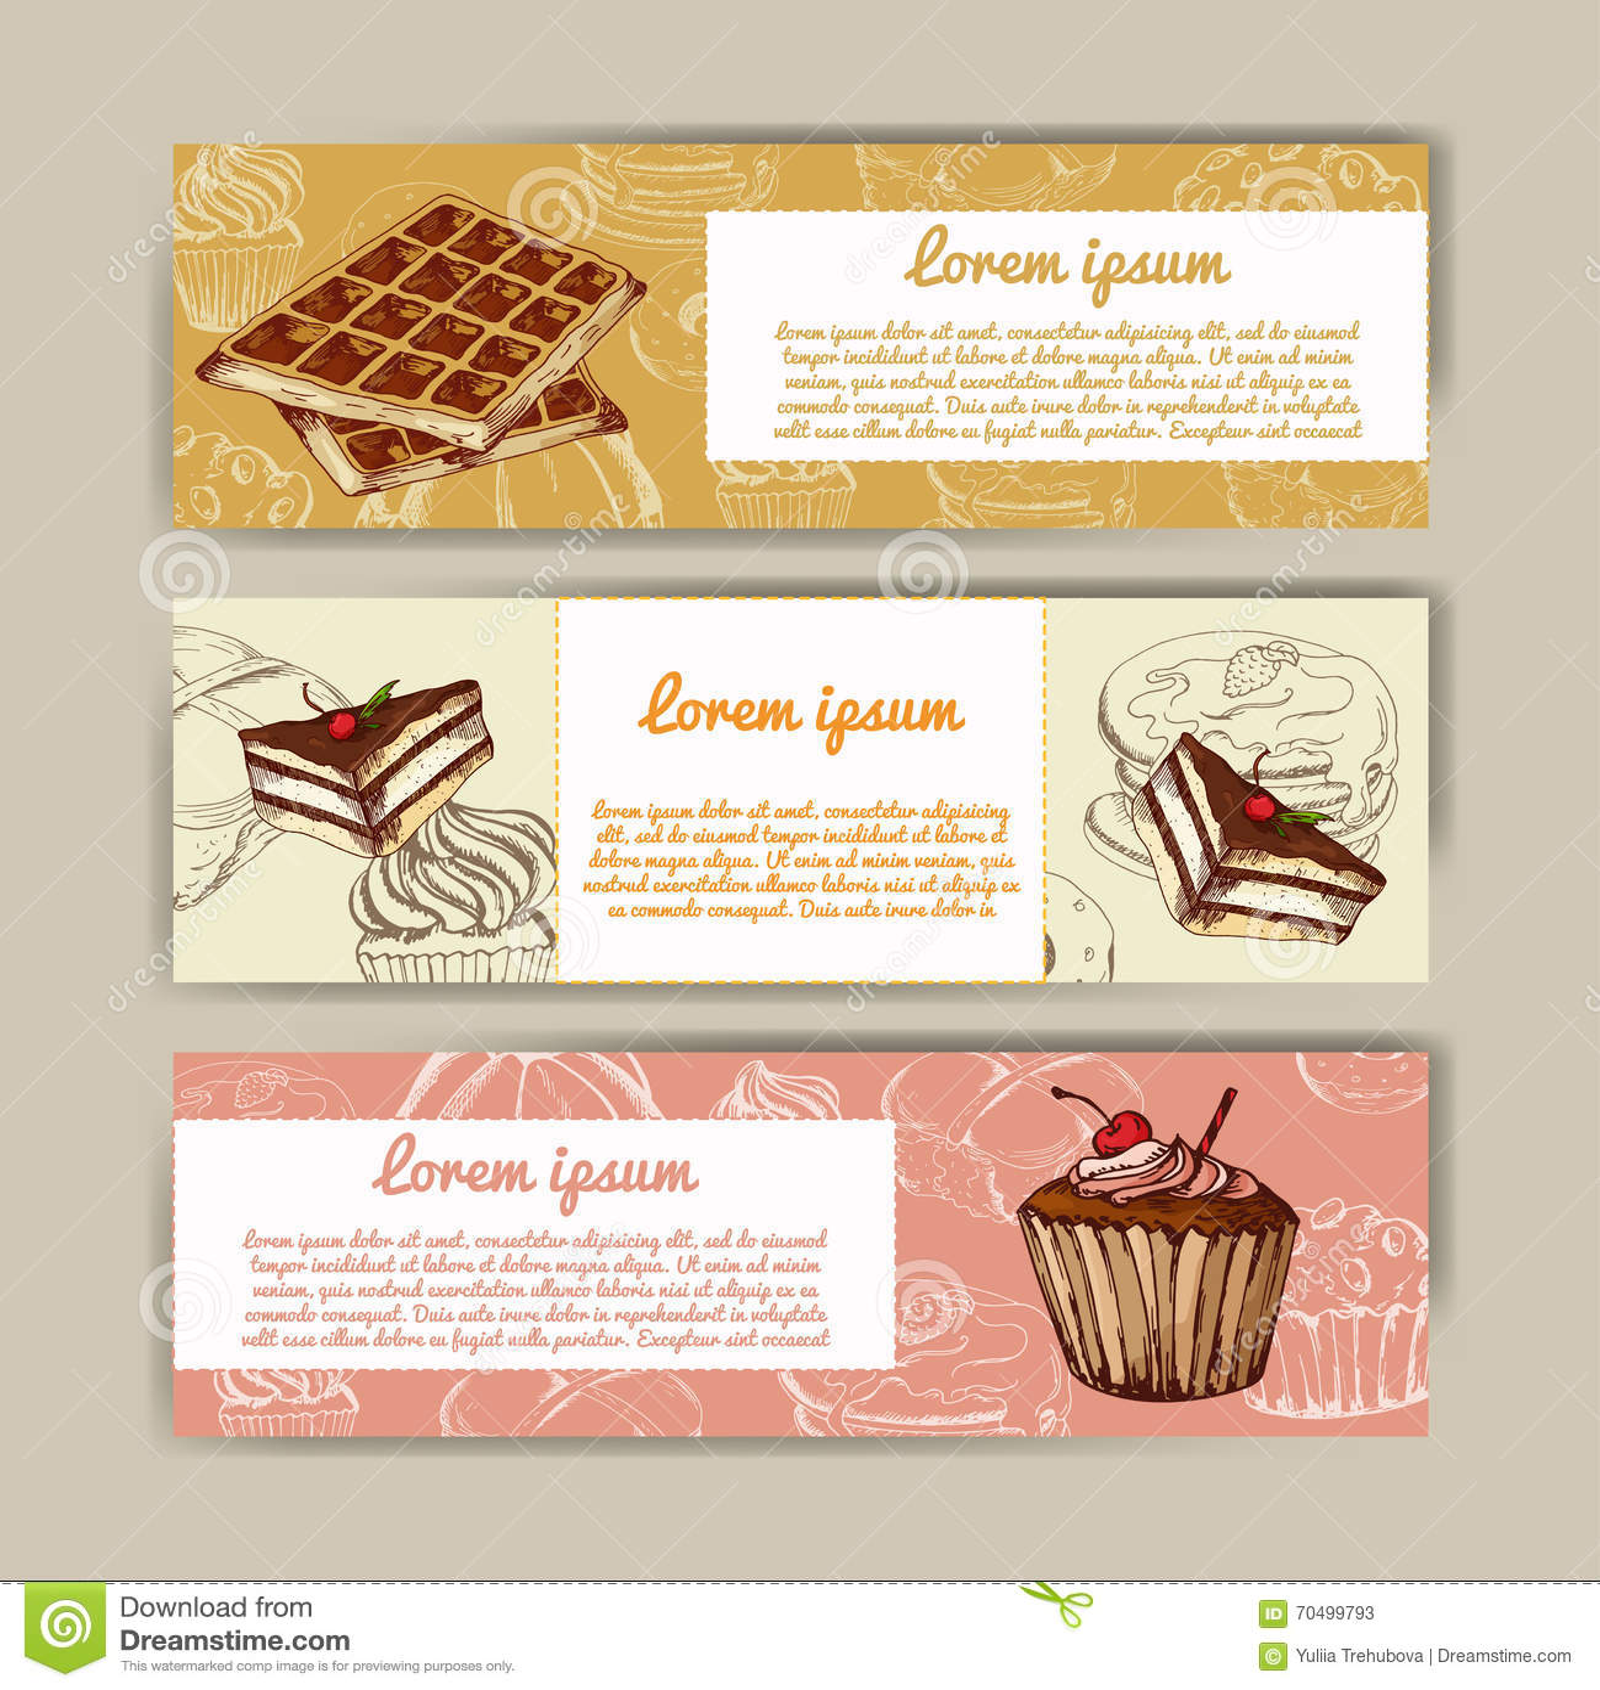 cafe banners with hand drawn design dessert restaurant menu template set of cards for. Black Bedroom Furniture Sets. Home Design Ideas